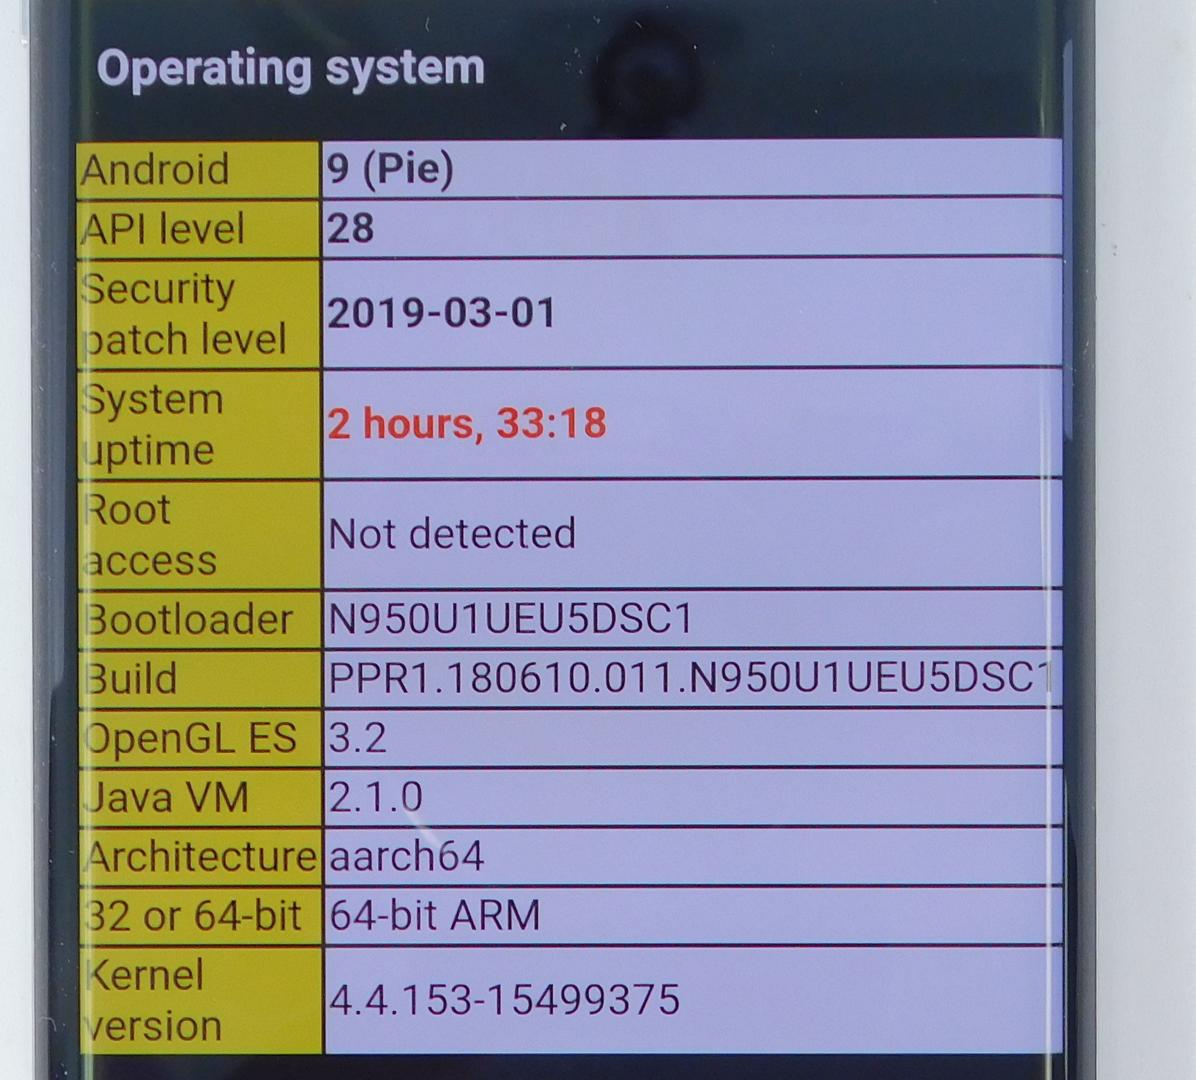 Samsung Galaxy Note 8 (Verizon) [SM-N950U] - Gray, 64 GB